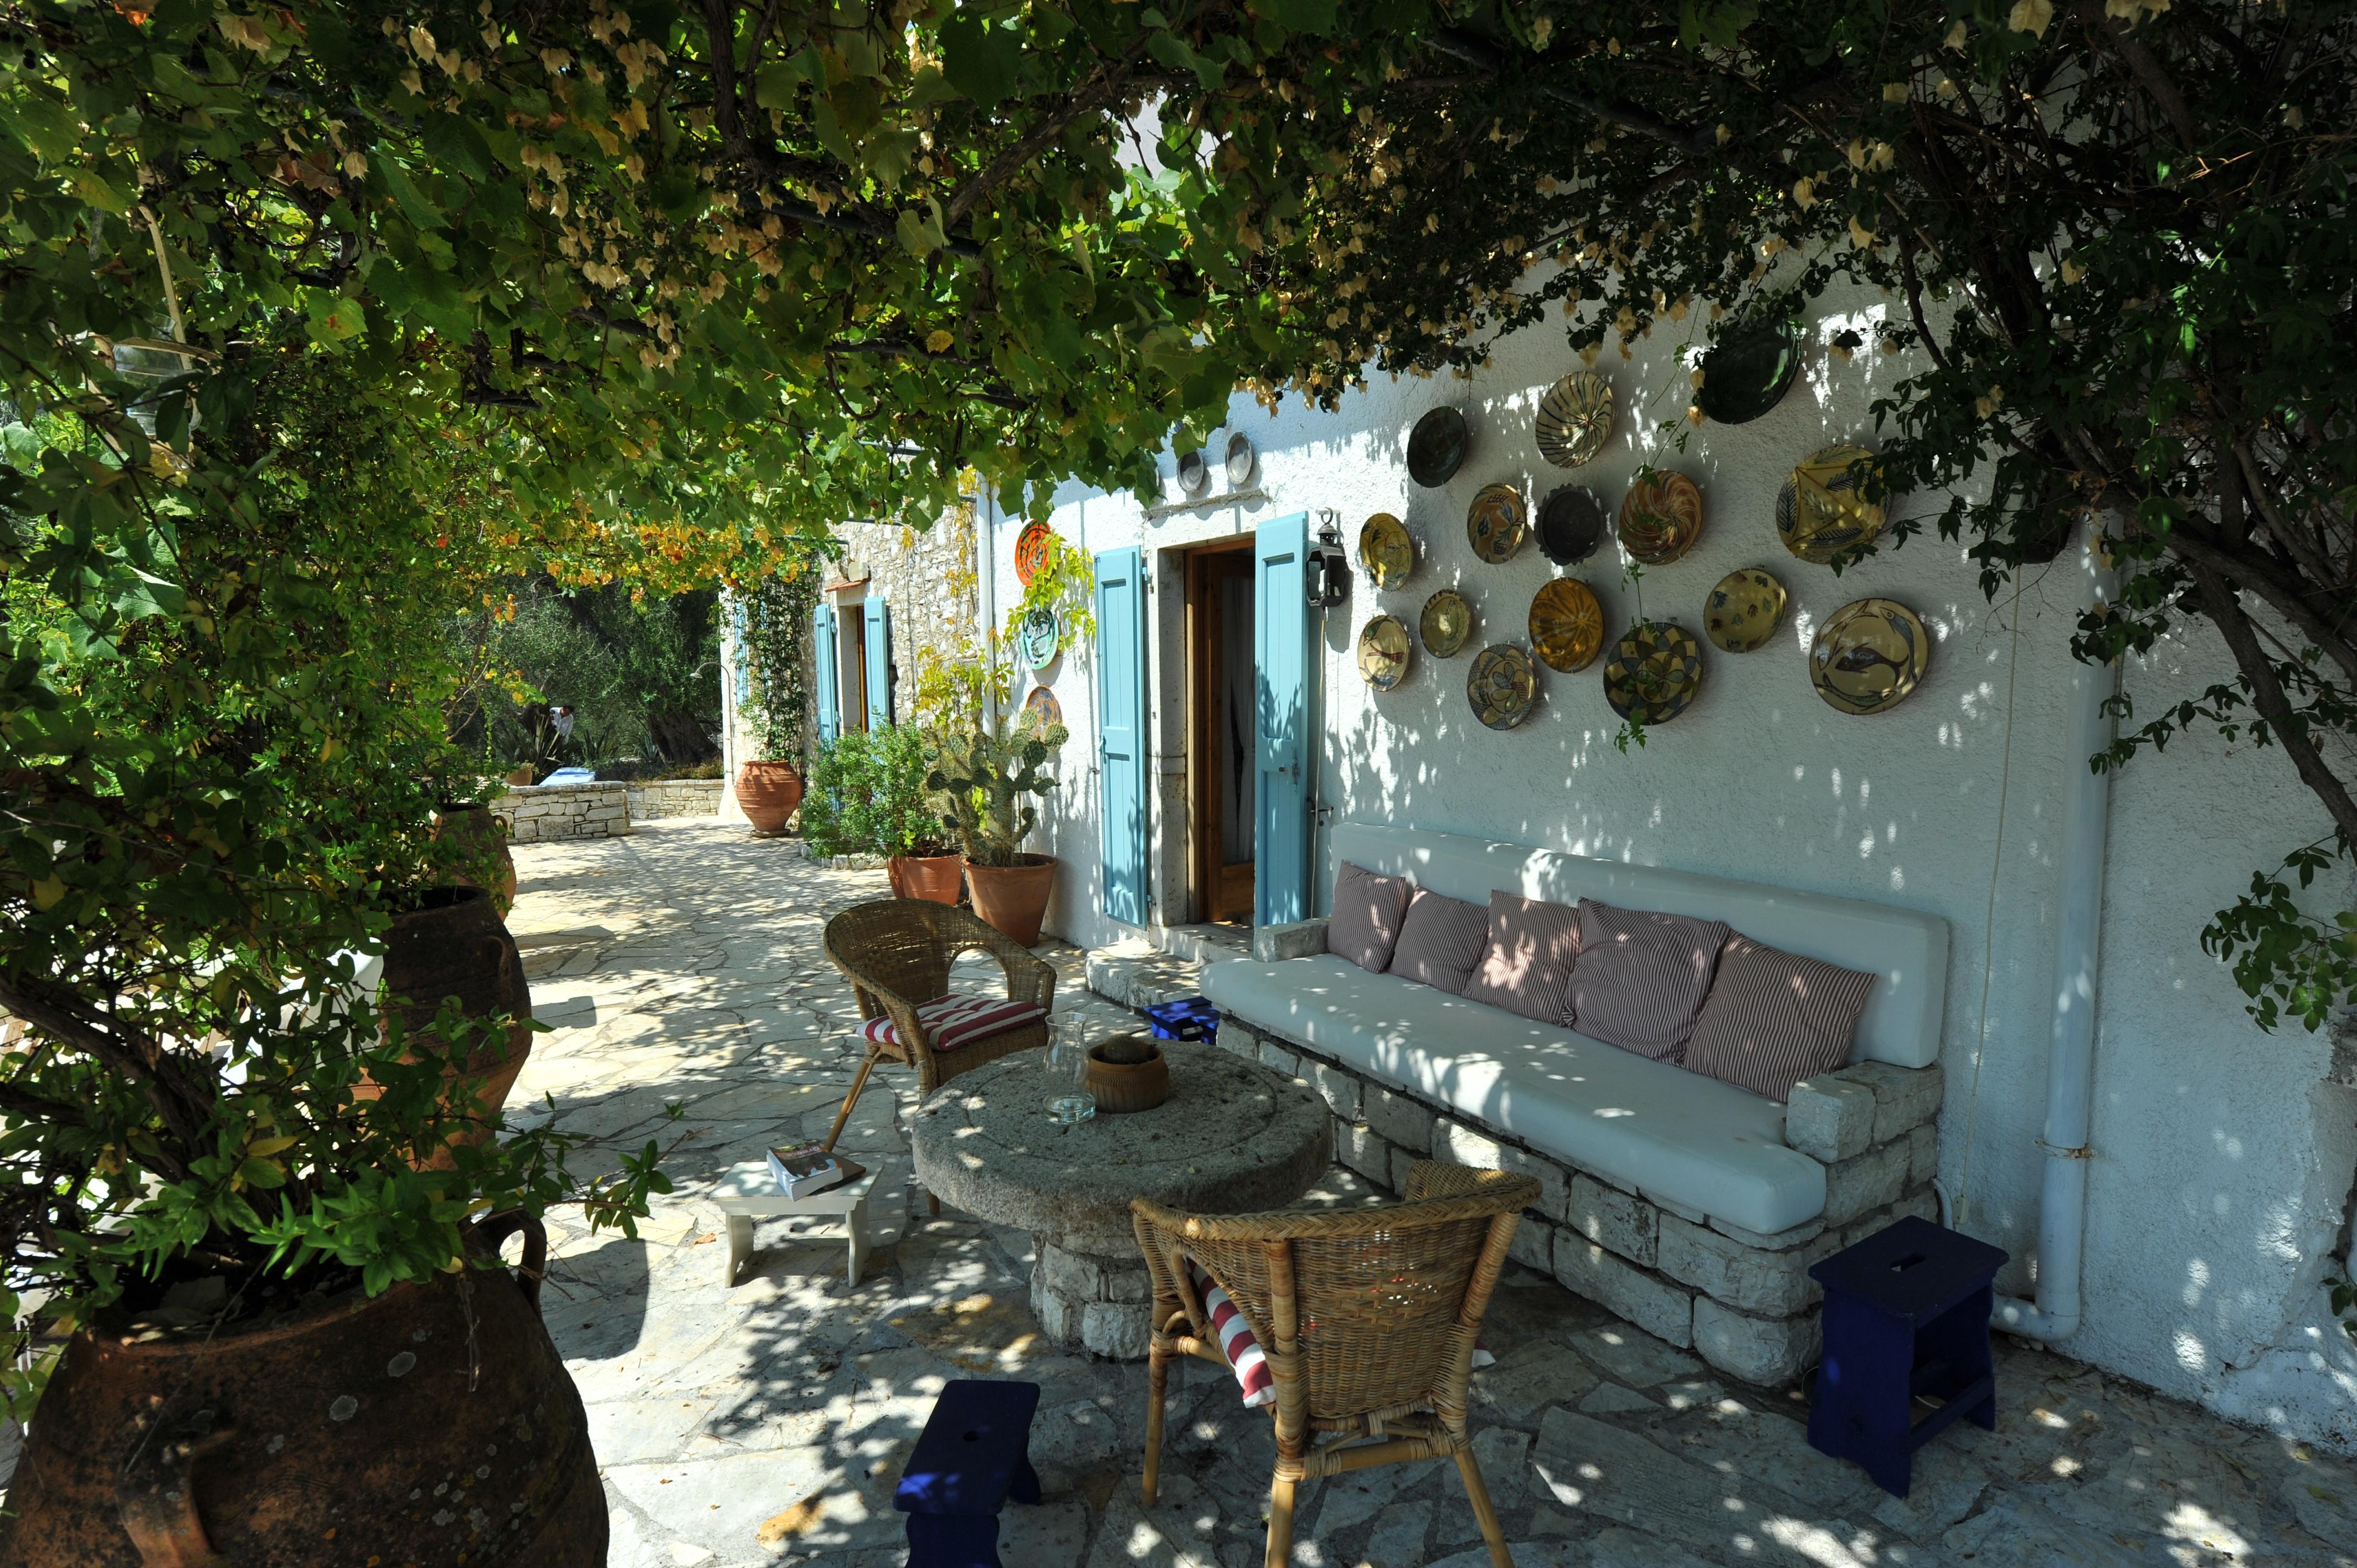 corfu_The_olive_press_agni_pergola_vine_stone_sofa_big_terrace